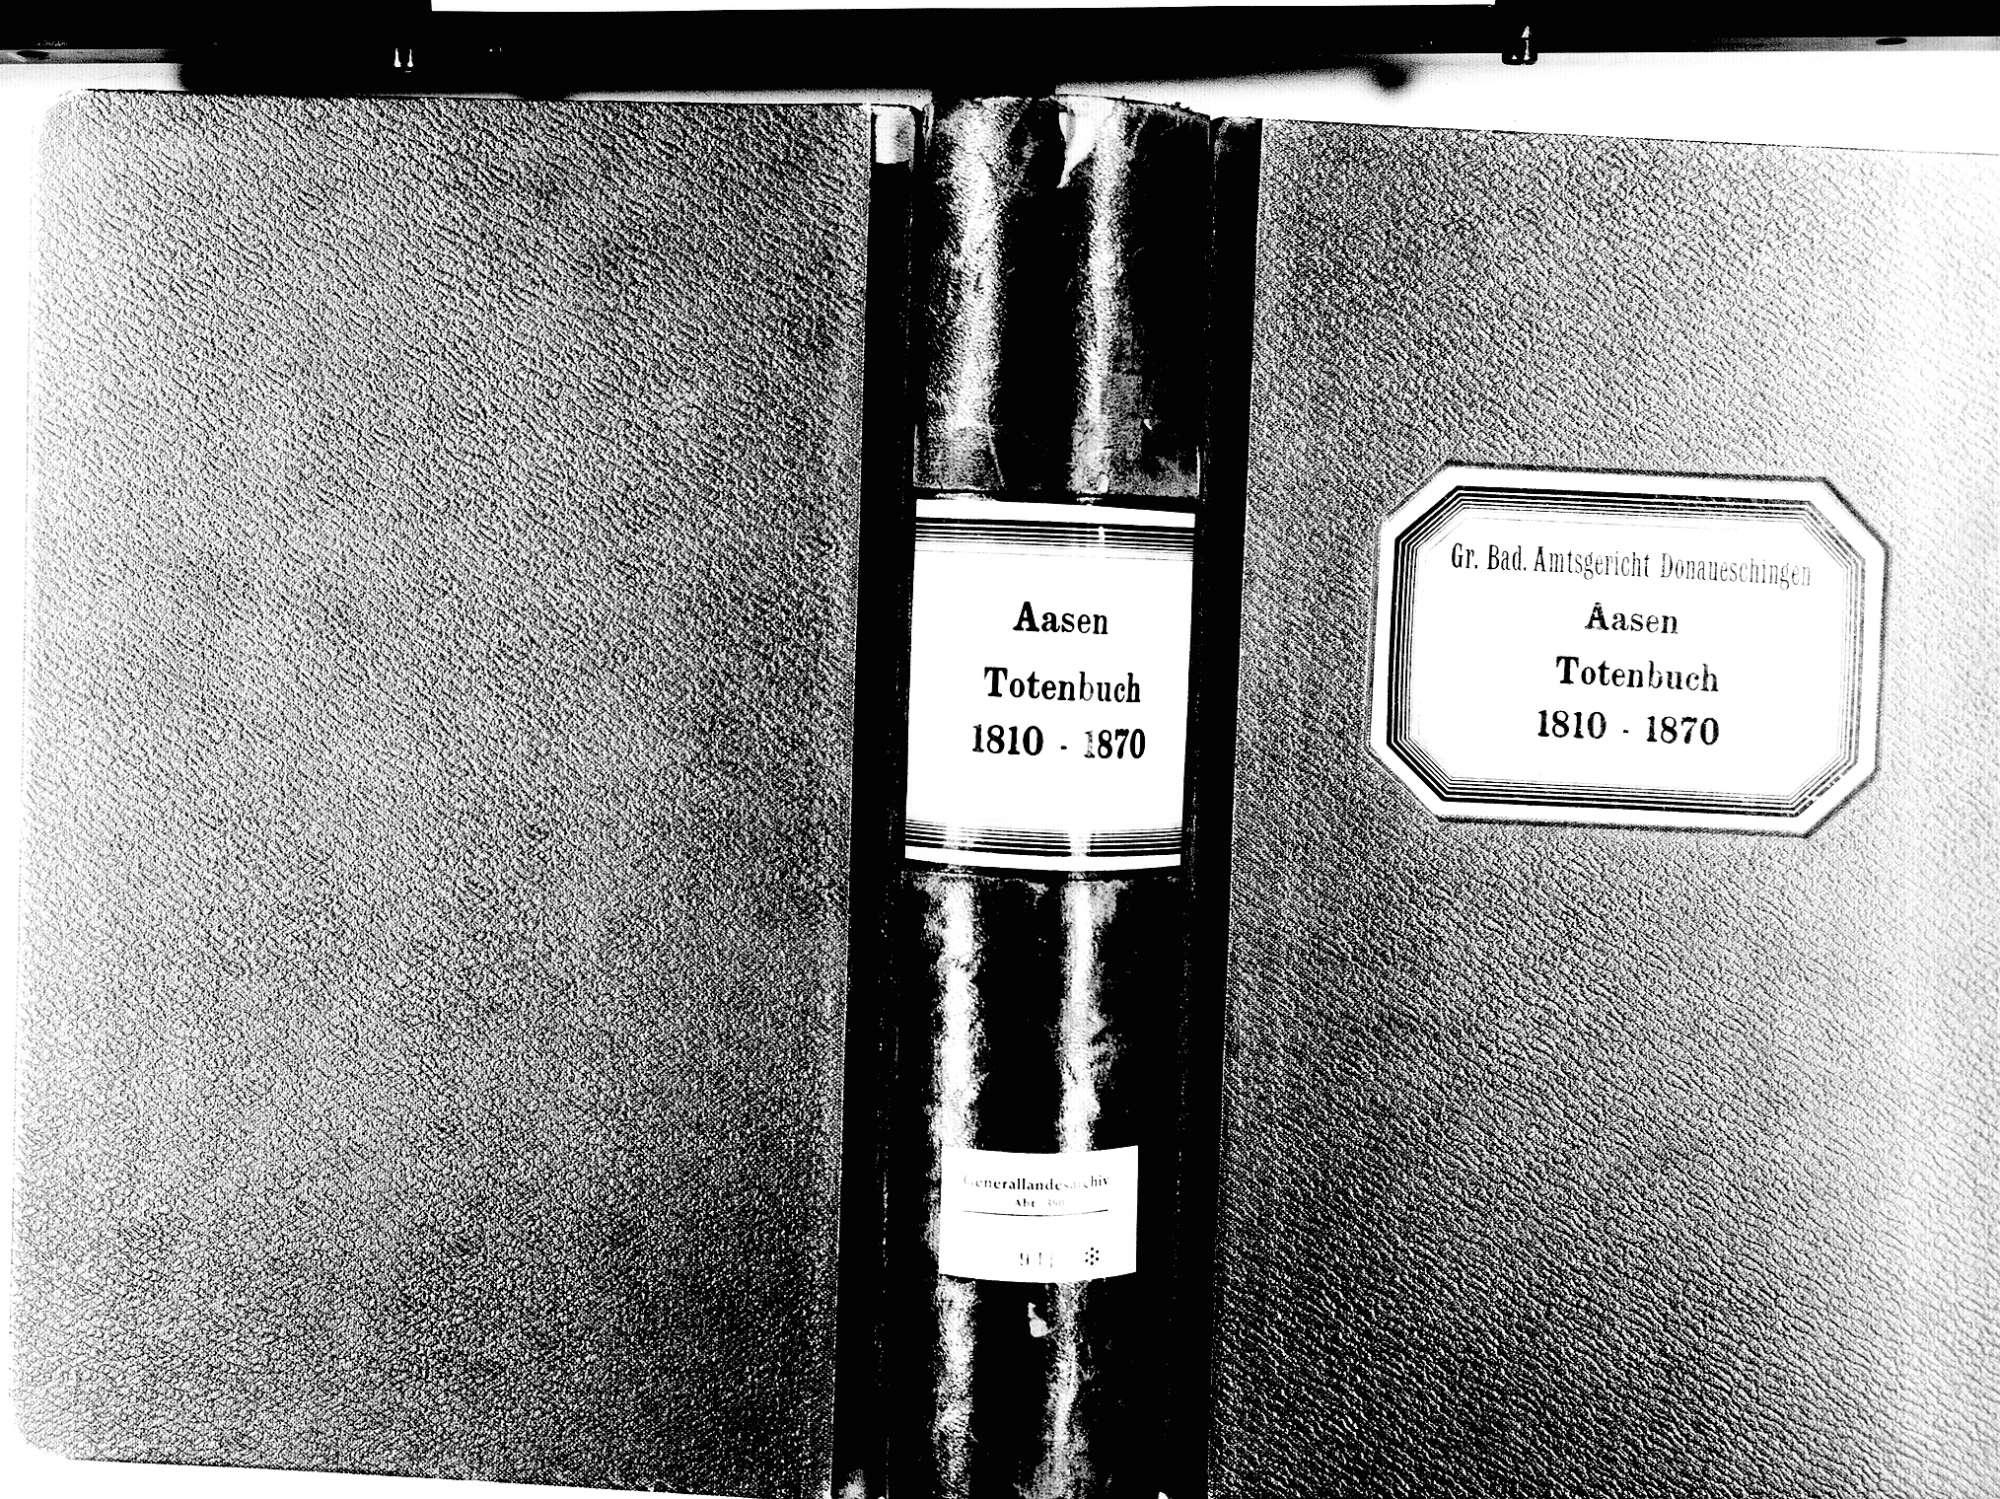 Aasen, Donaueschingen VS; Katholische Gemeinde: Sterbebuch 1810-1870, Bild 1